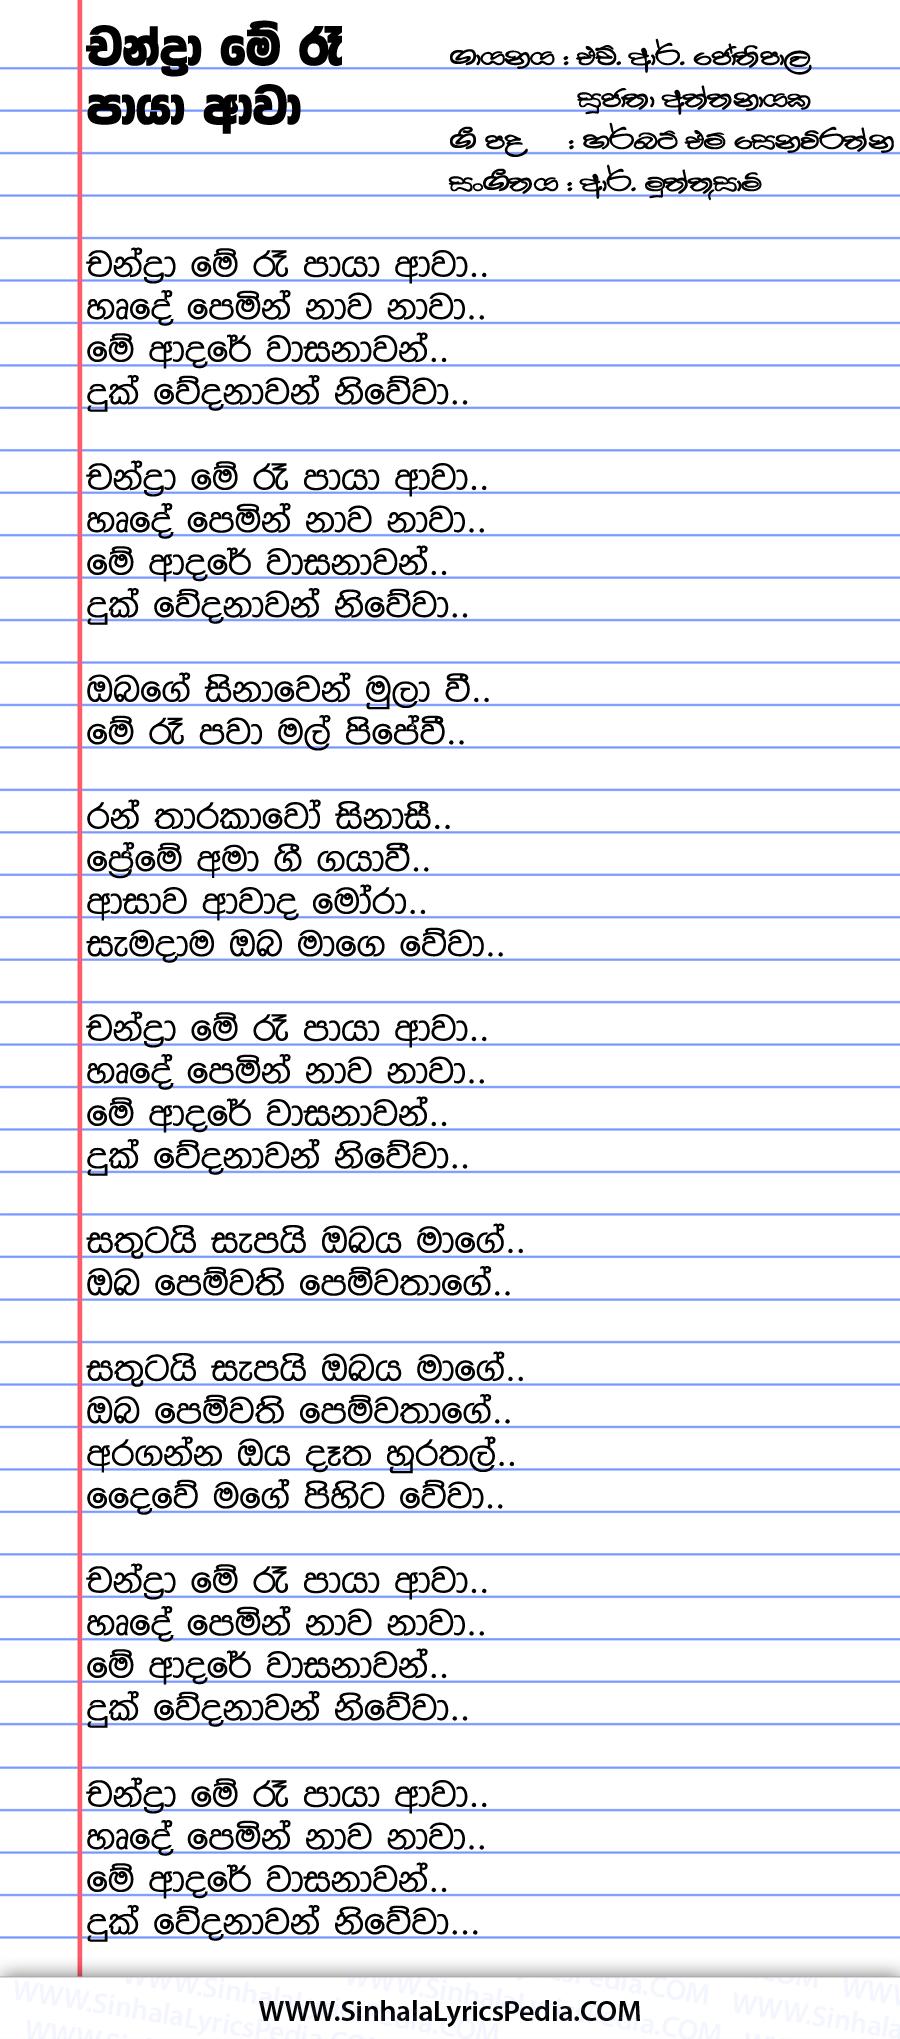 Chandra Me Raa Paya Awa Song Lyrics